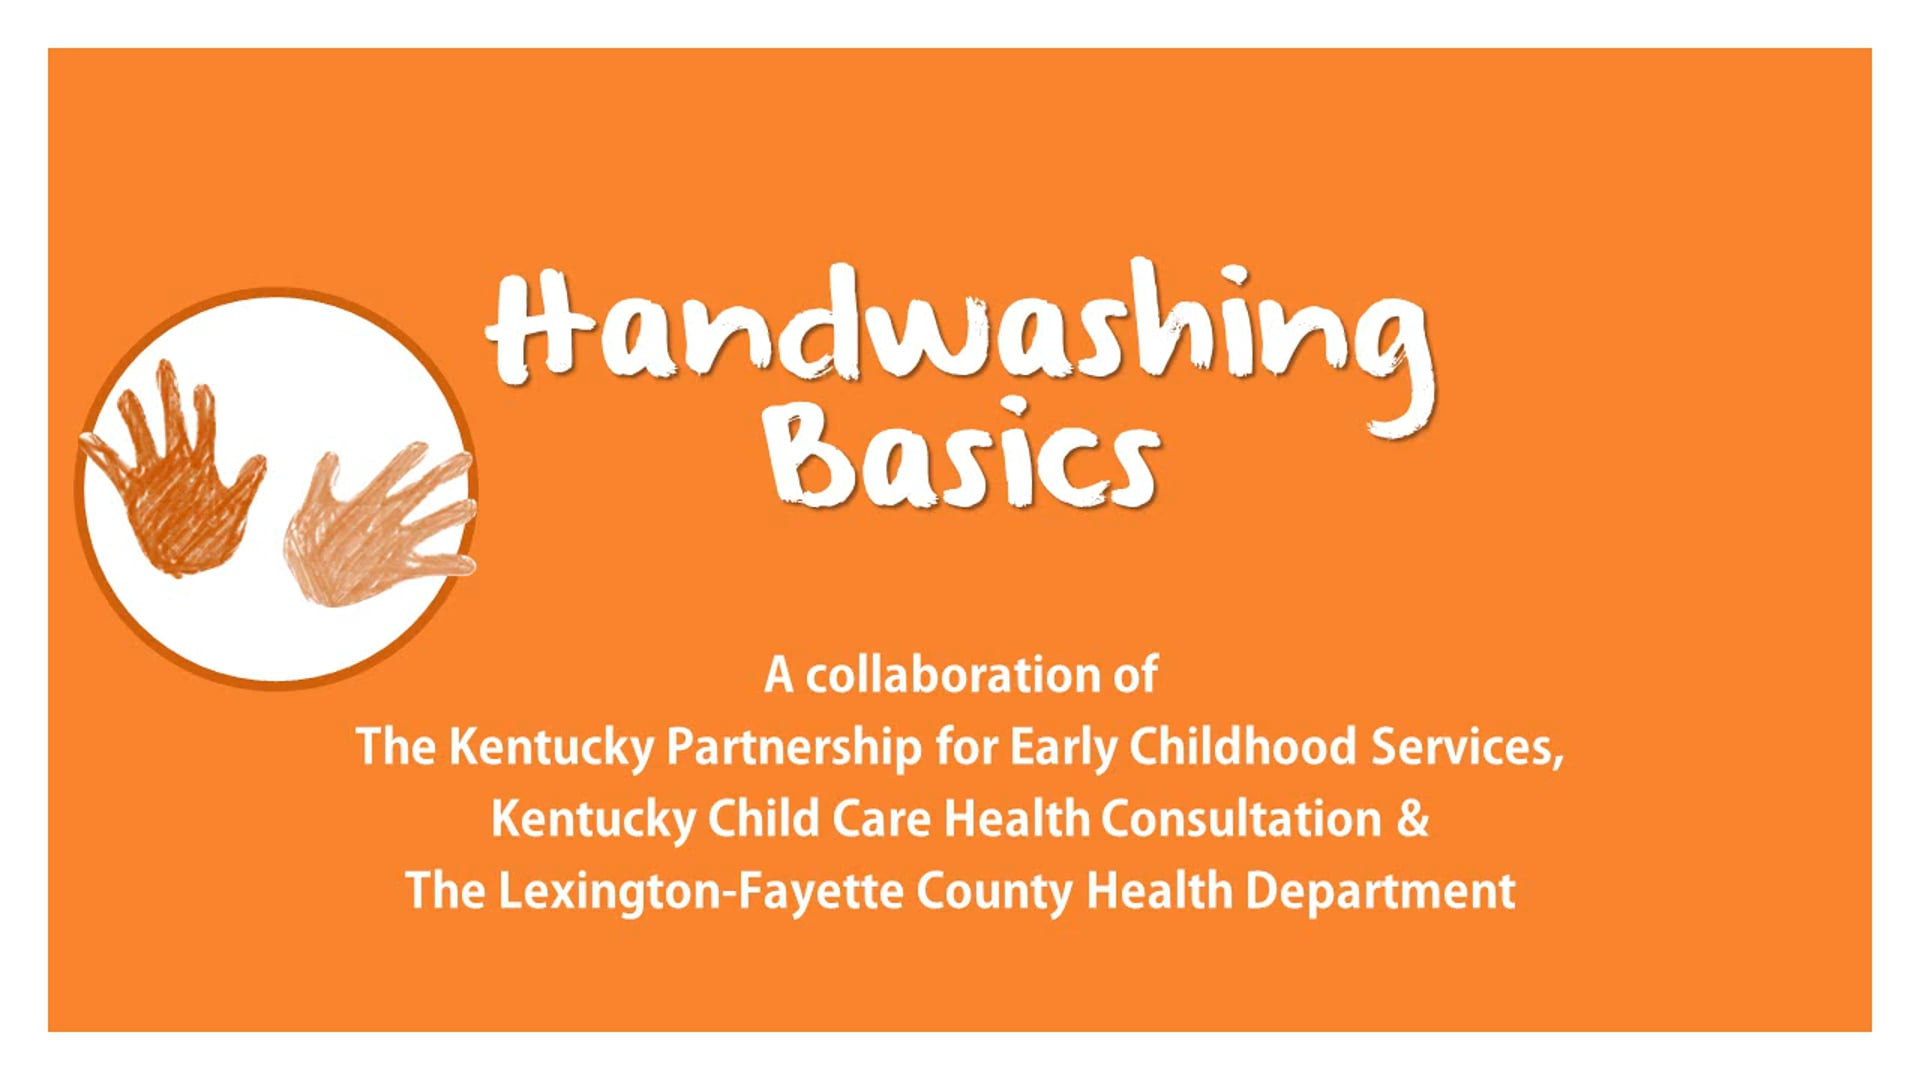 Handwashing Basics